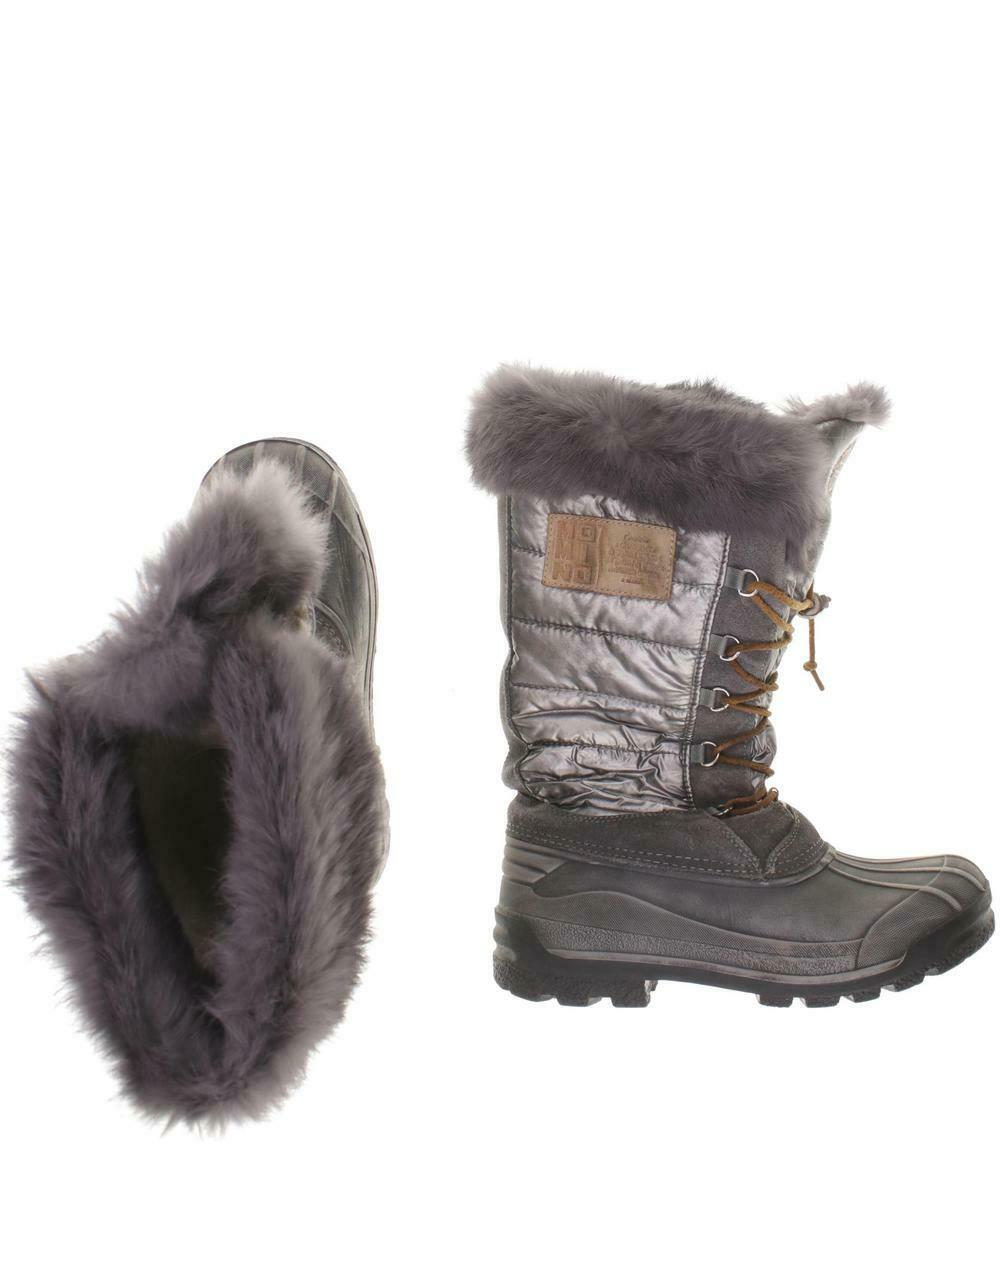 Momino Stiefel Damen Stiefel Gr. DE 38 kein Etikett grau  73e23a6